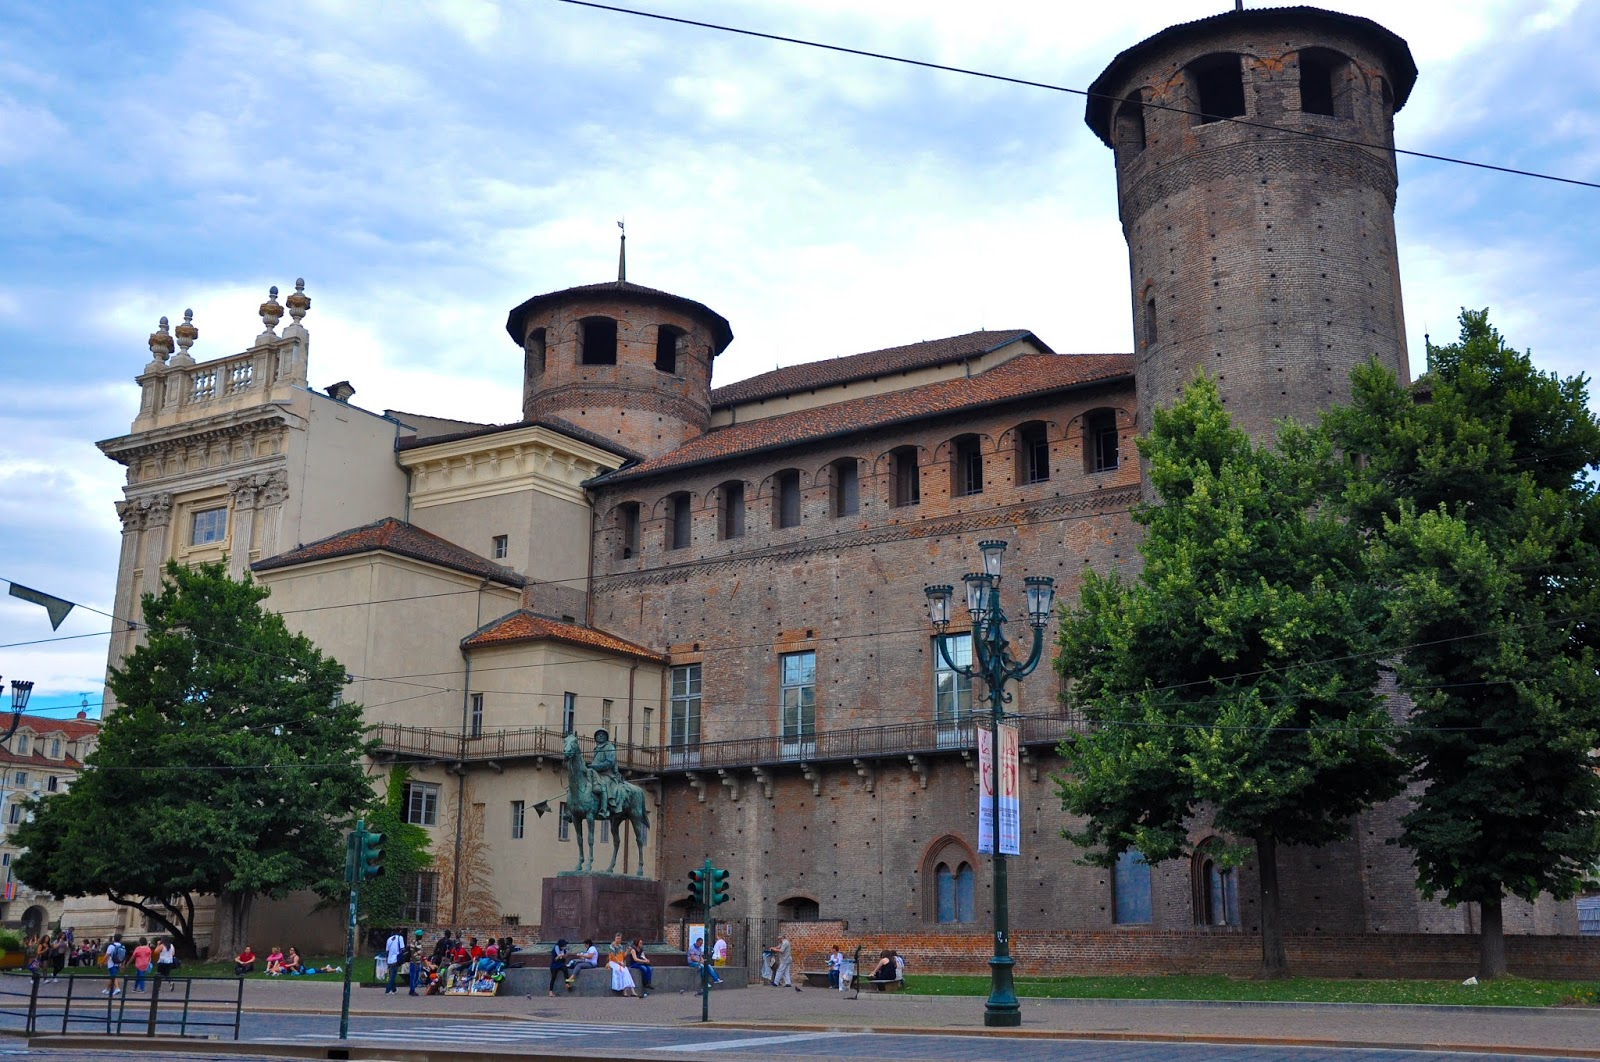 Side view of Palazzo Madama, Turin, Italy